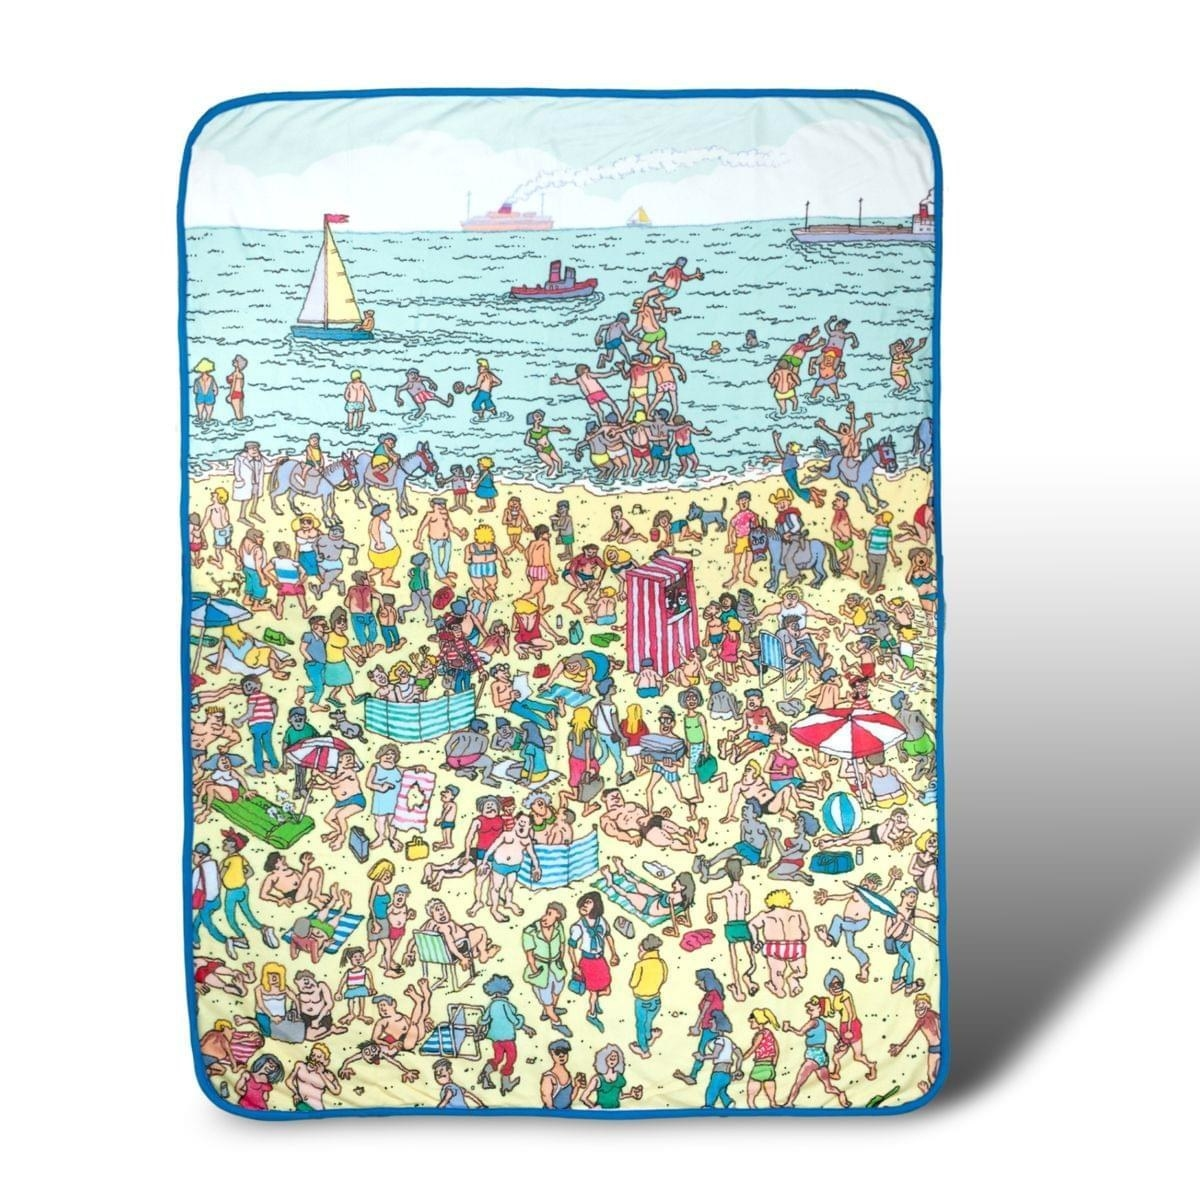 The blanket with a beach-themed Where's Waldo scene